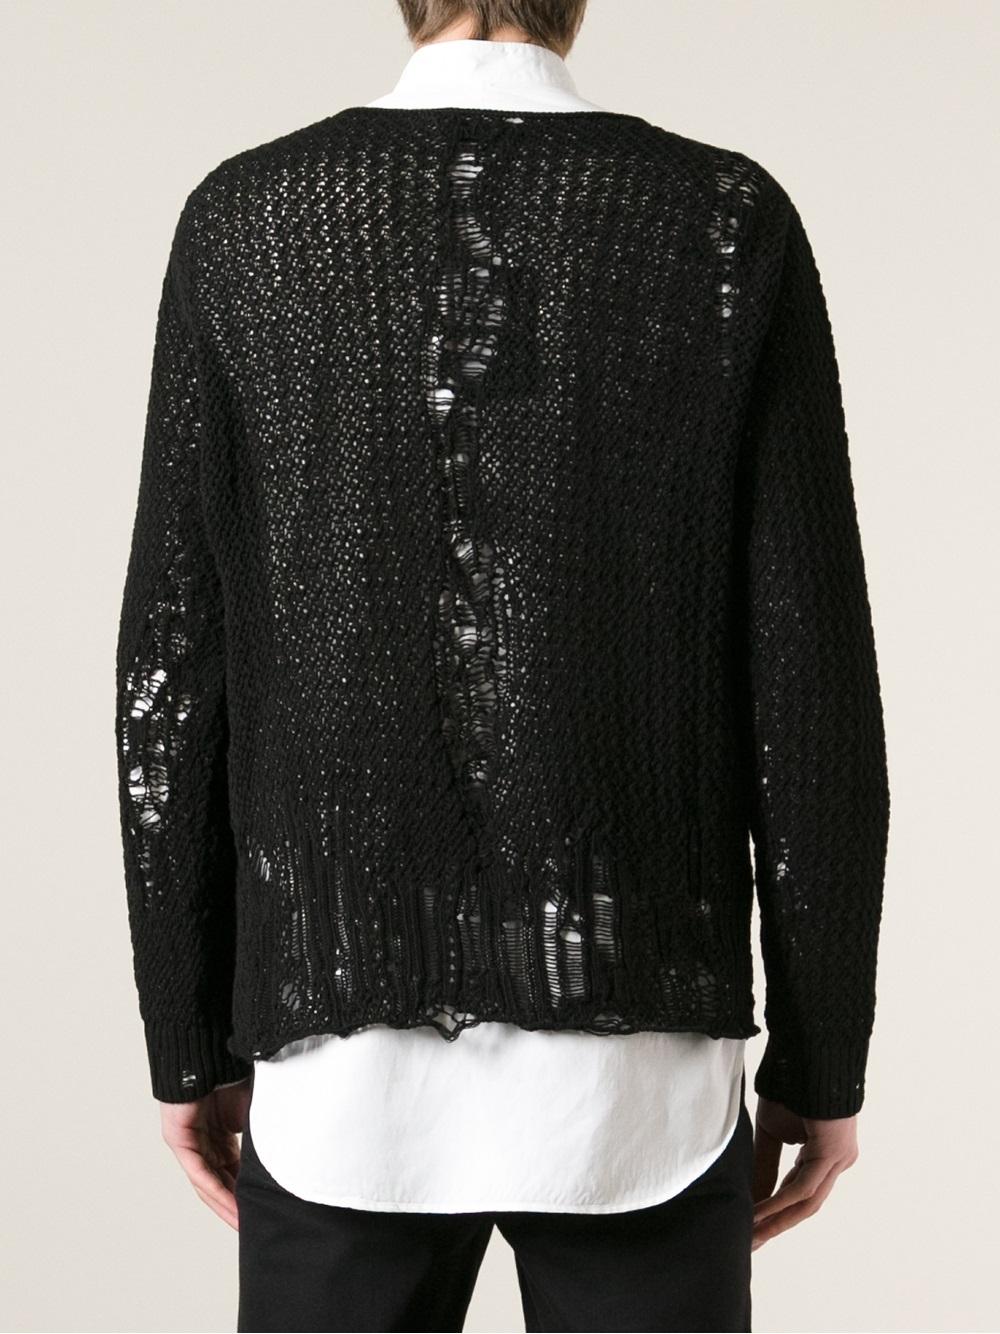 Alexander Mcqueen Distressed Sweater In Black For Men Lyst